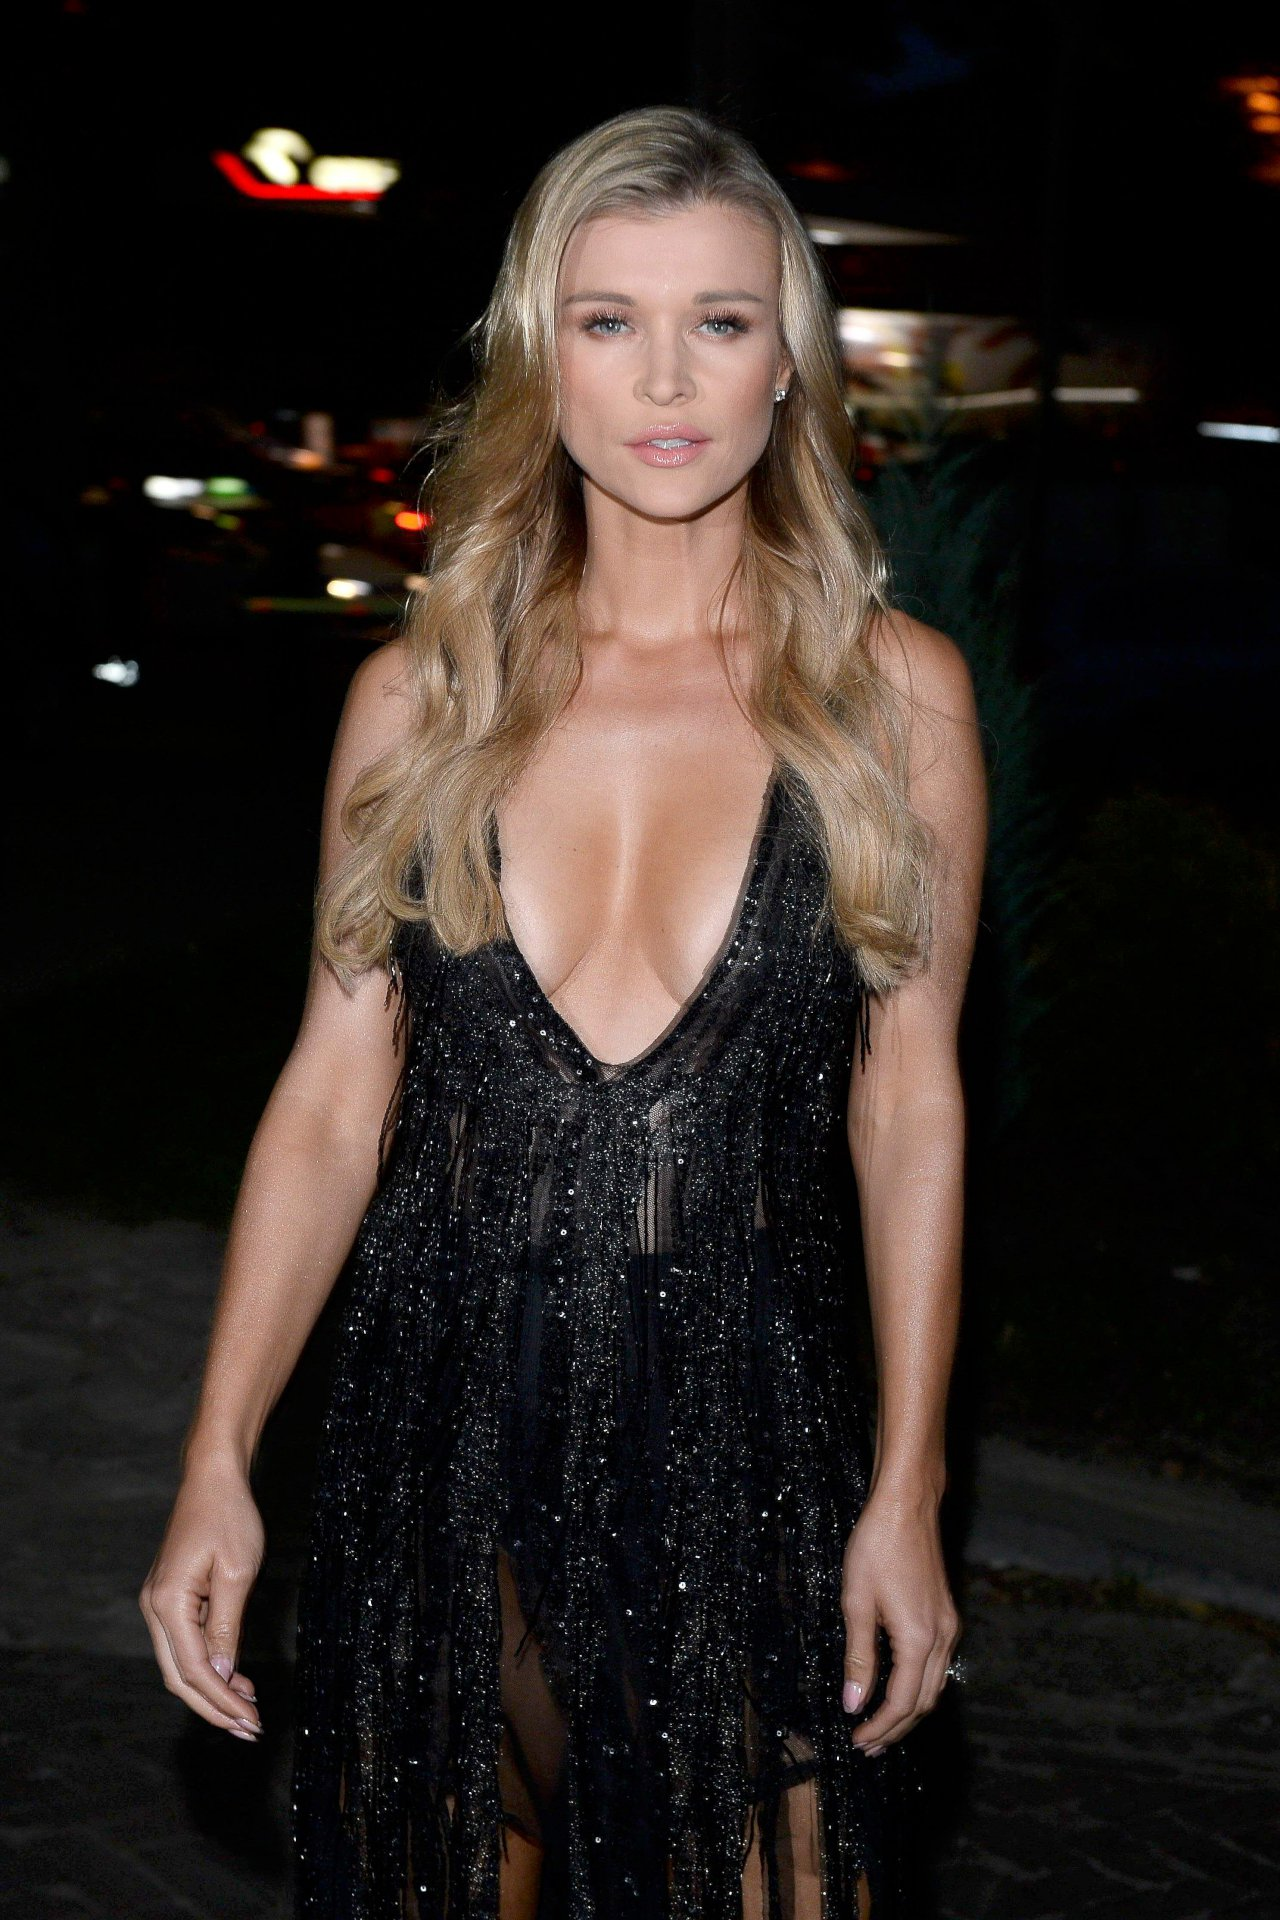 Joanna krupa sexy 7 nudes (39 photos), Is a cute Celebrity fotos